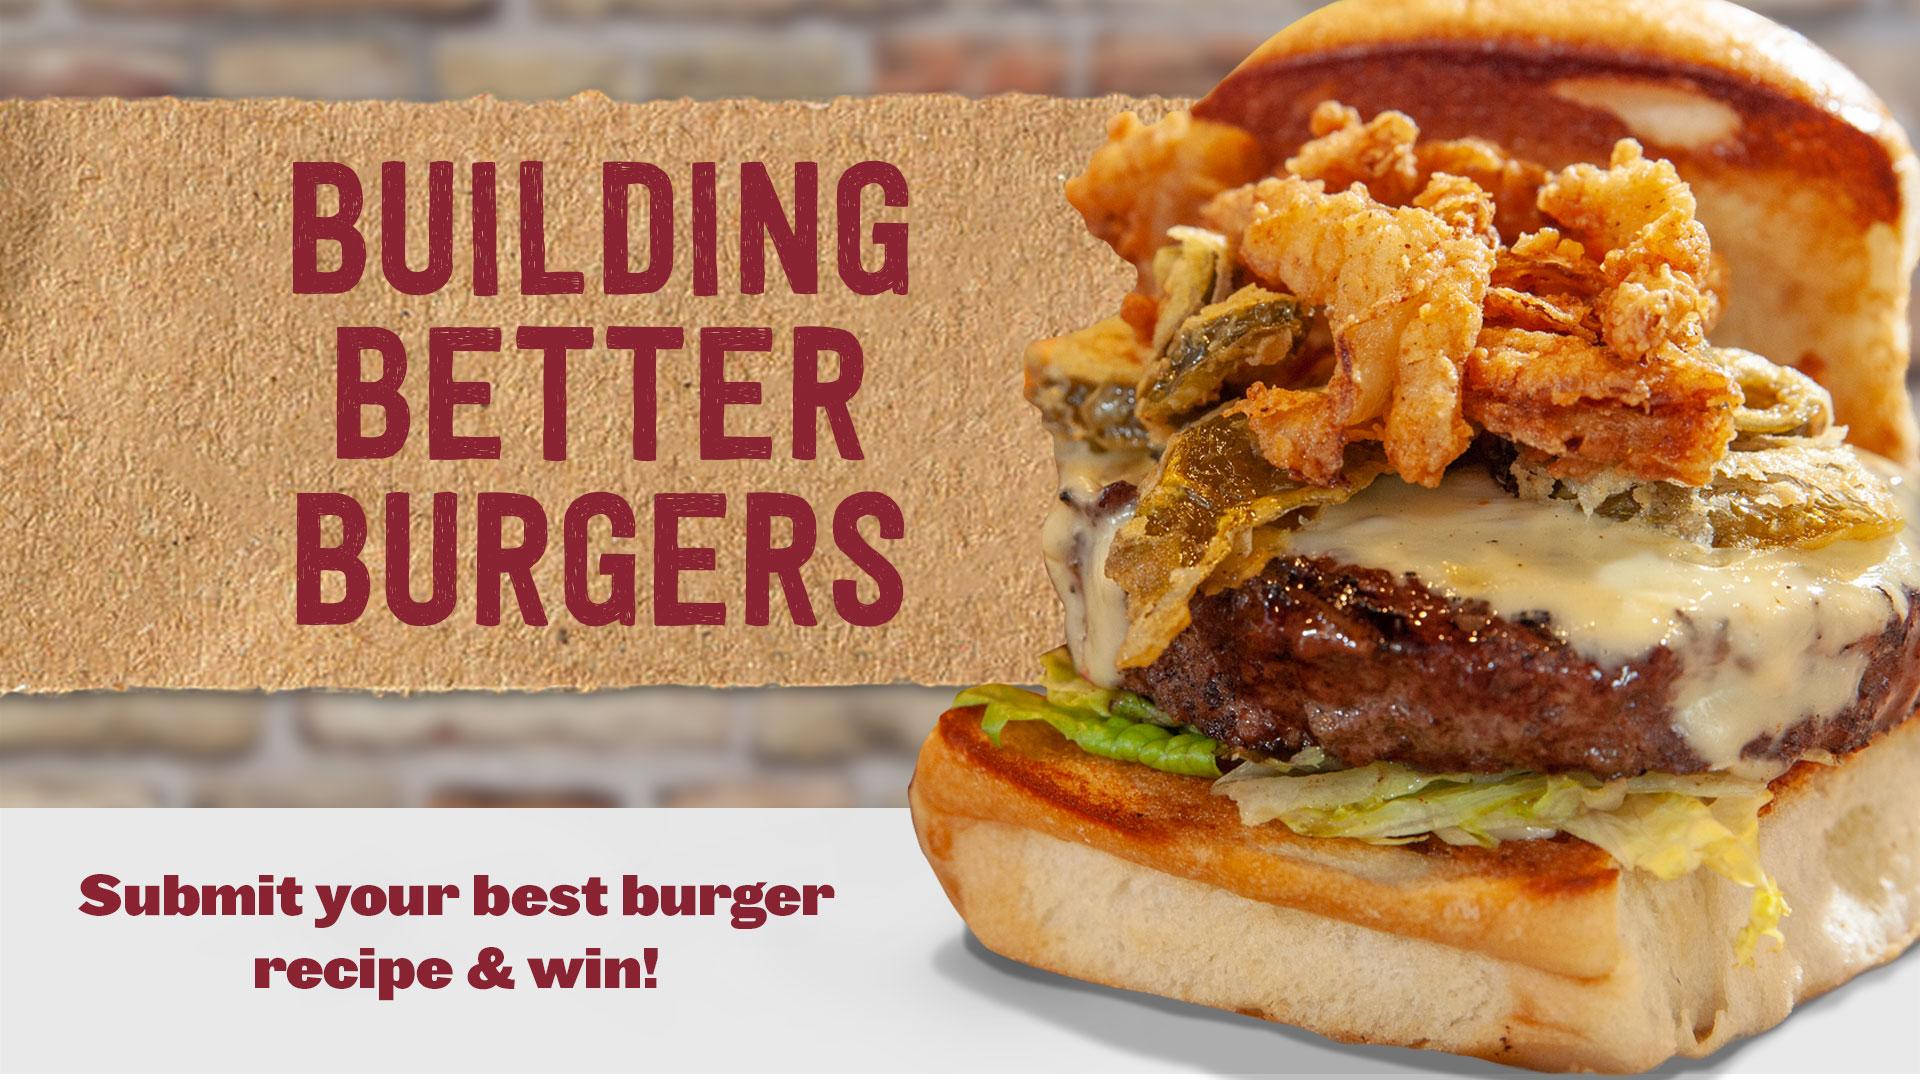 elvis-burger-contest.jpg